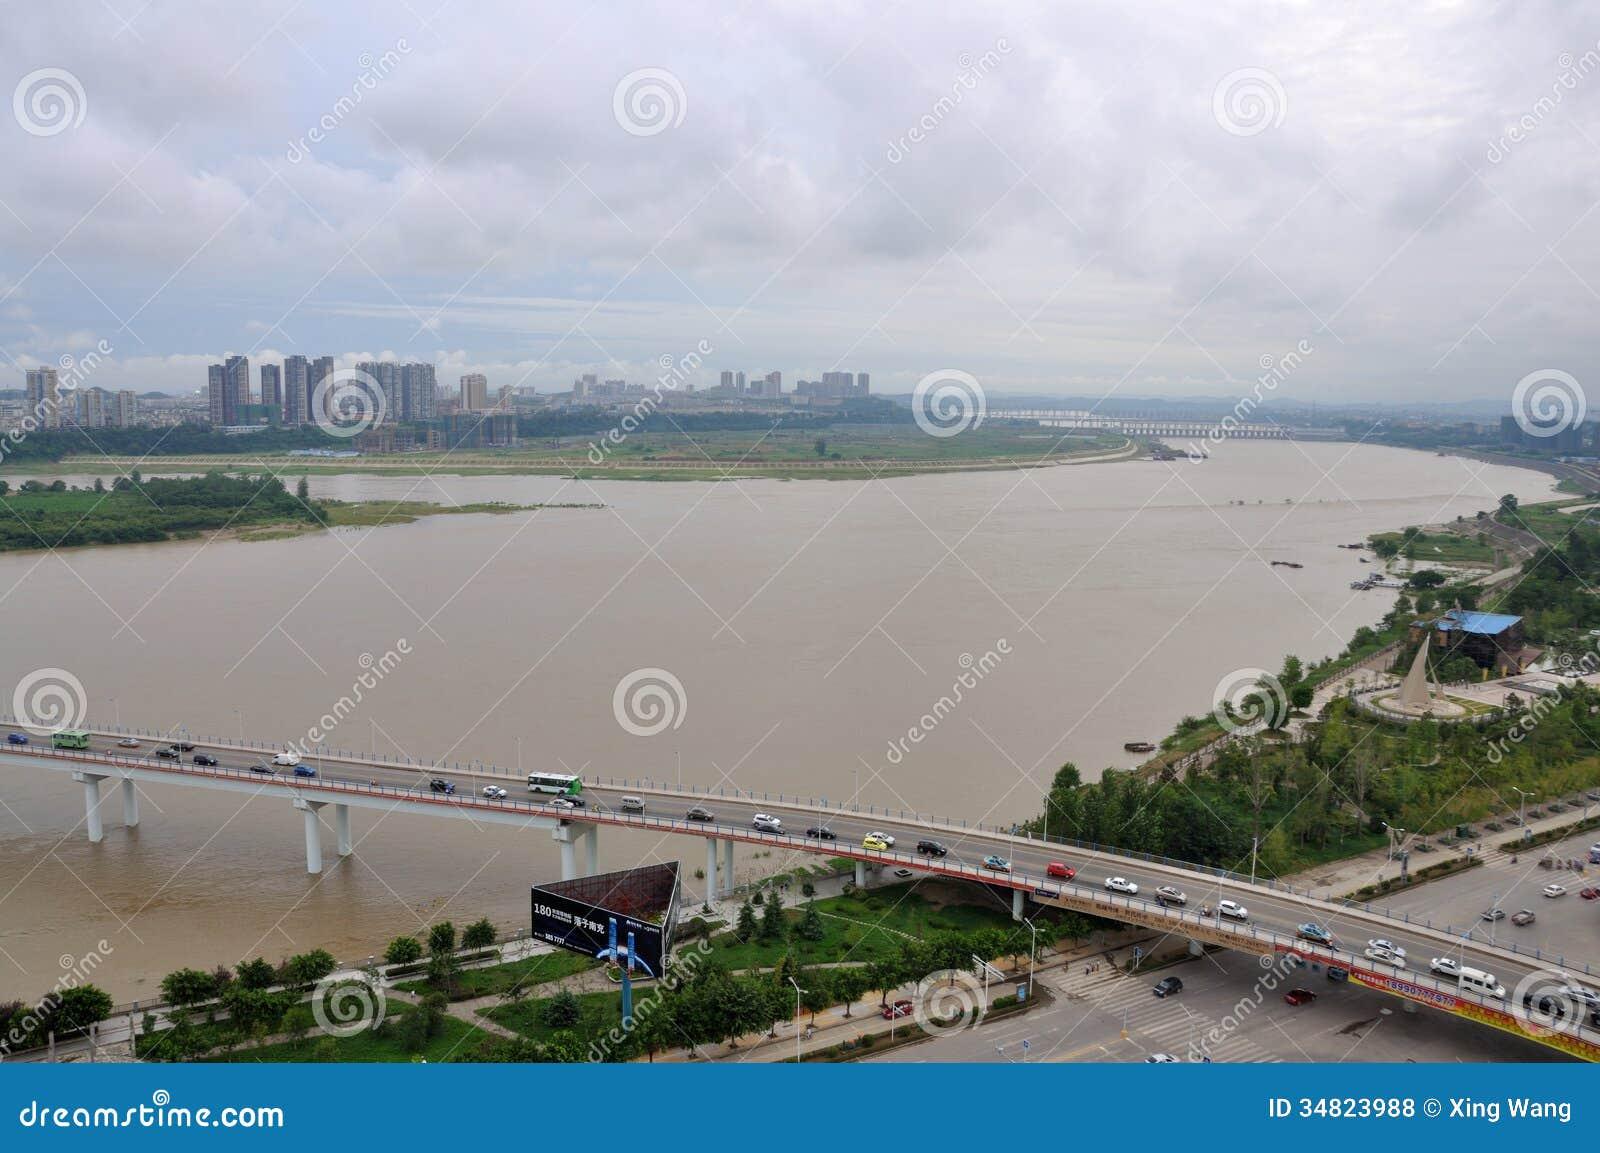 Nanchong China  City pictures : The Jialing River In Nanchong,China Editorial Stock Photo Image ...